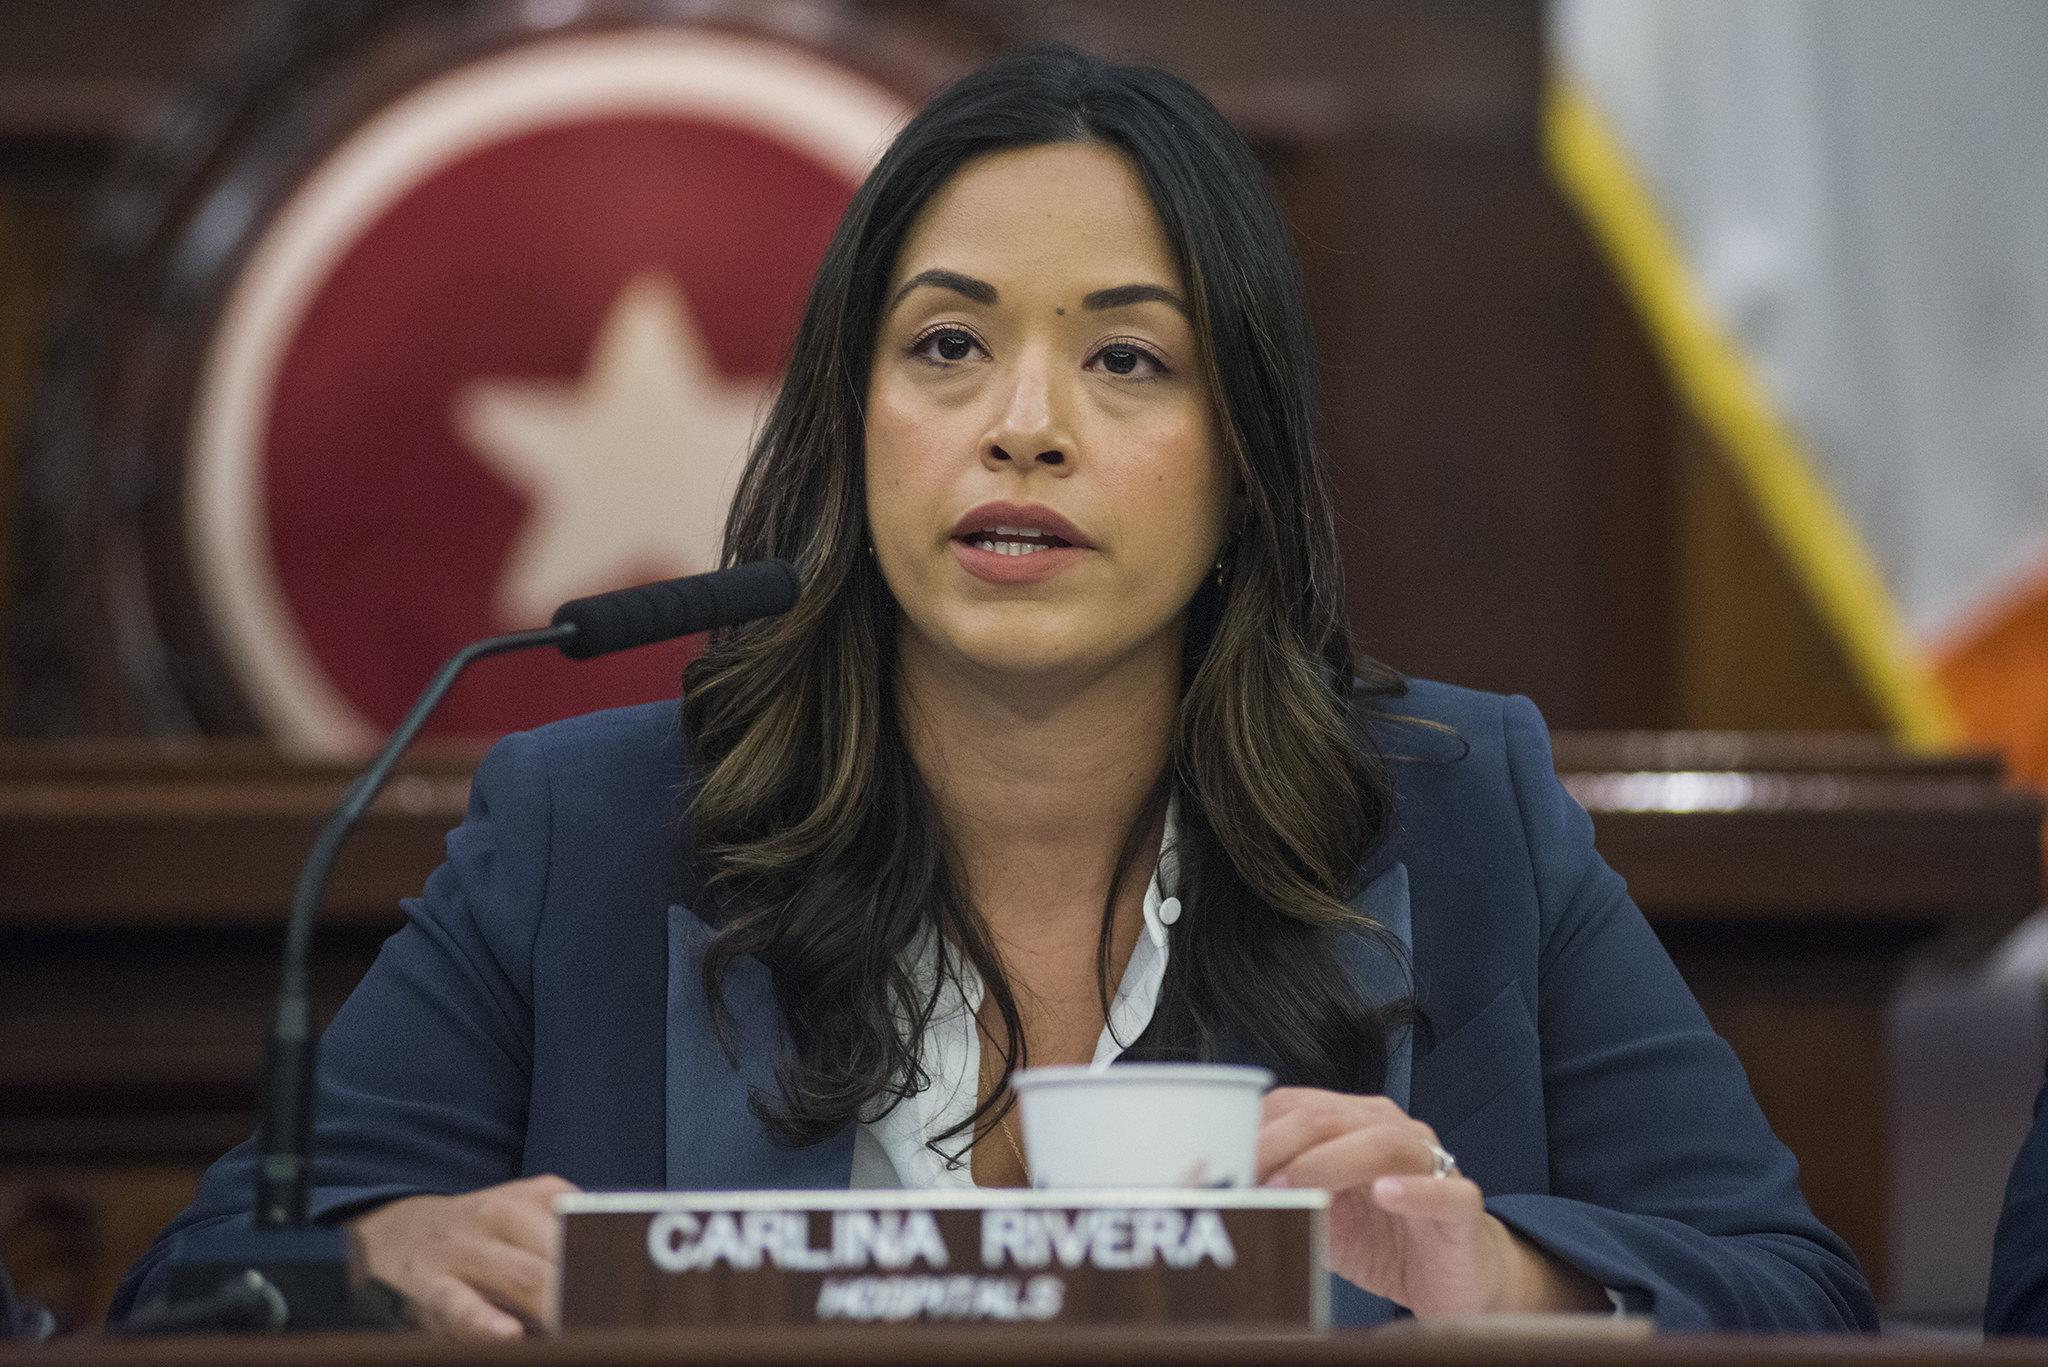 New York City Councilmember Carlina Rivera at Feb. 28 Immigration and Hospitals hearing.